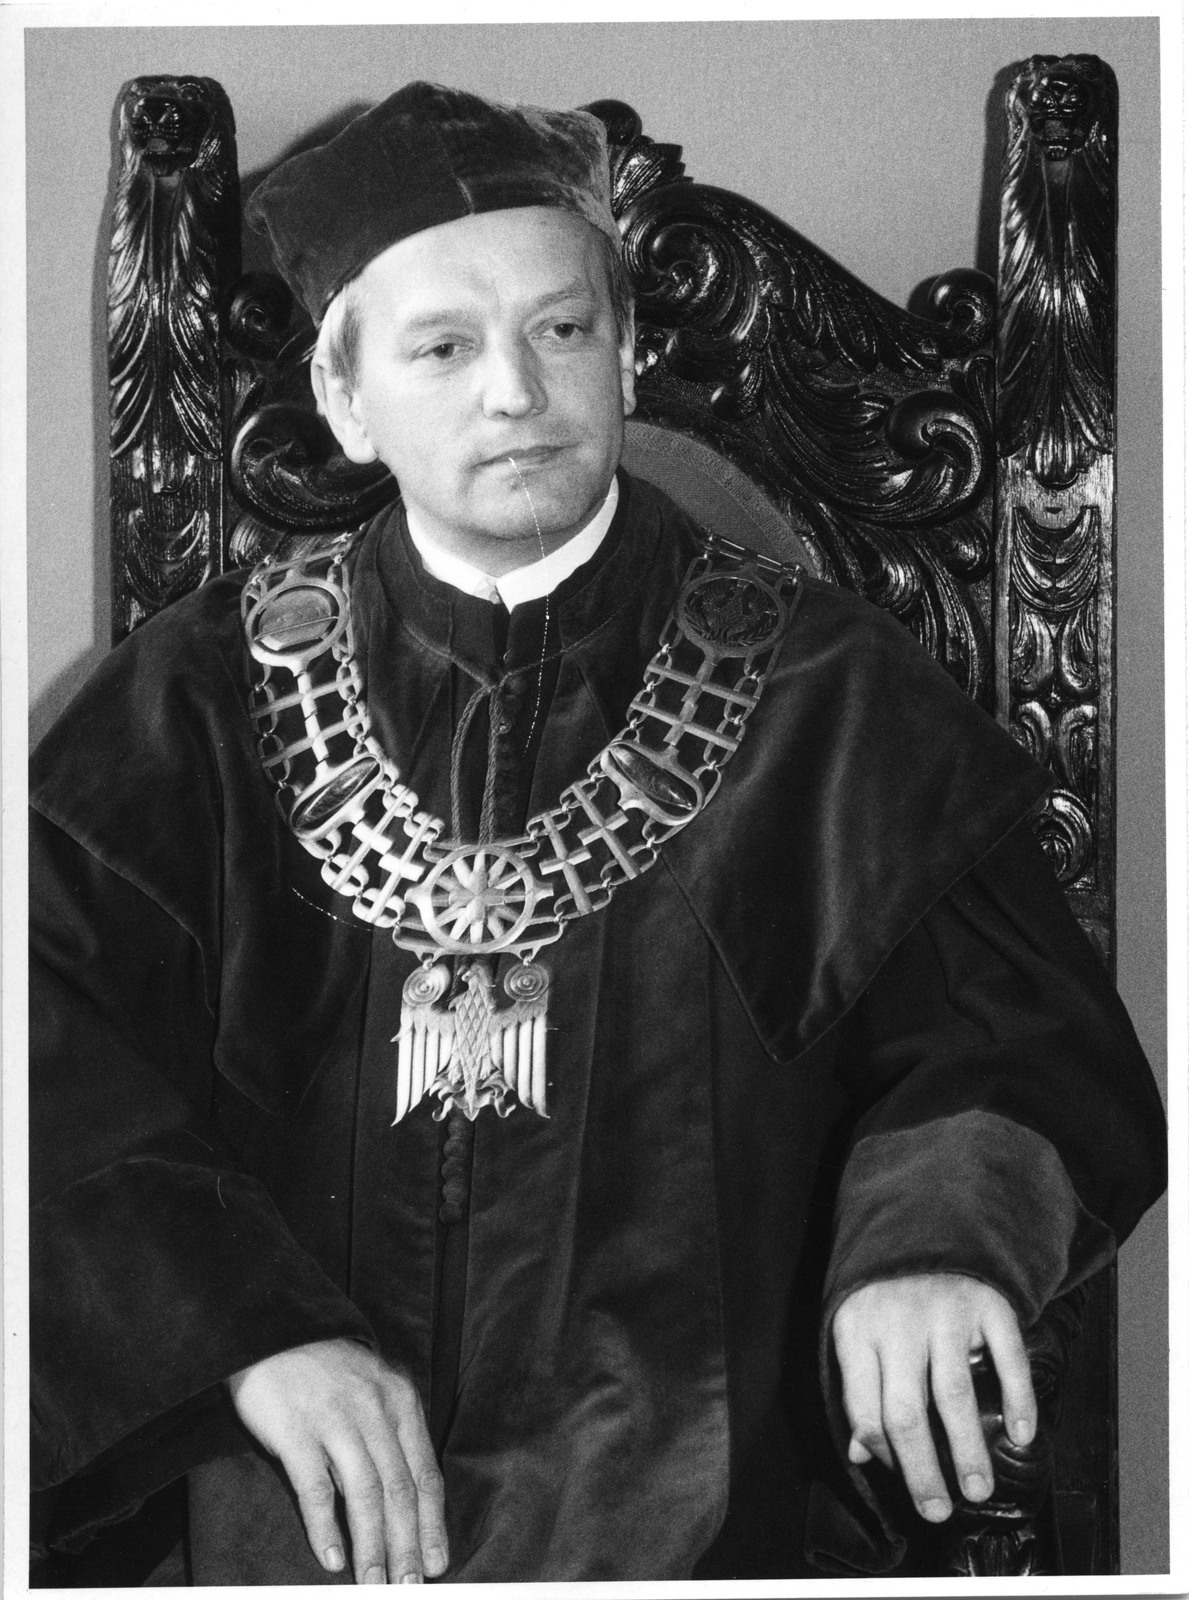 Ks. prof. Helmut Juros jako prorektor ATK